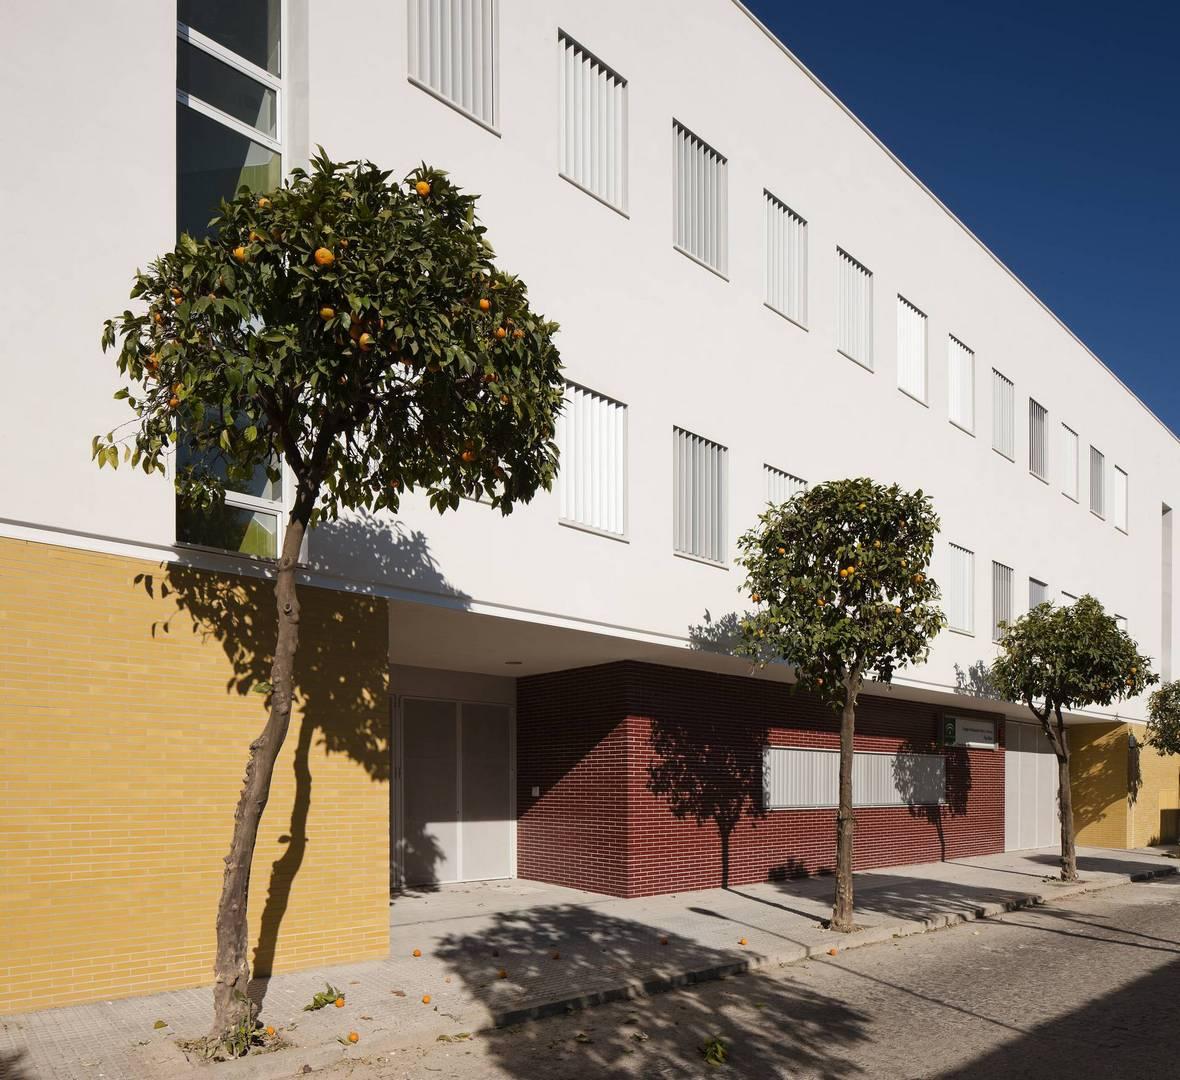 Colegio p blico fray albino en c rdoba unia arquitectos - Arquitectos en cordoba ...